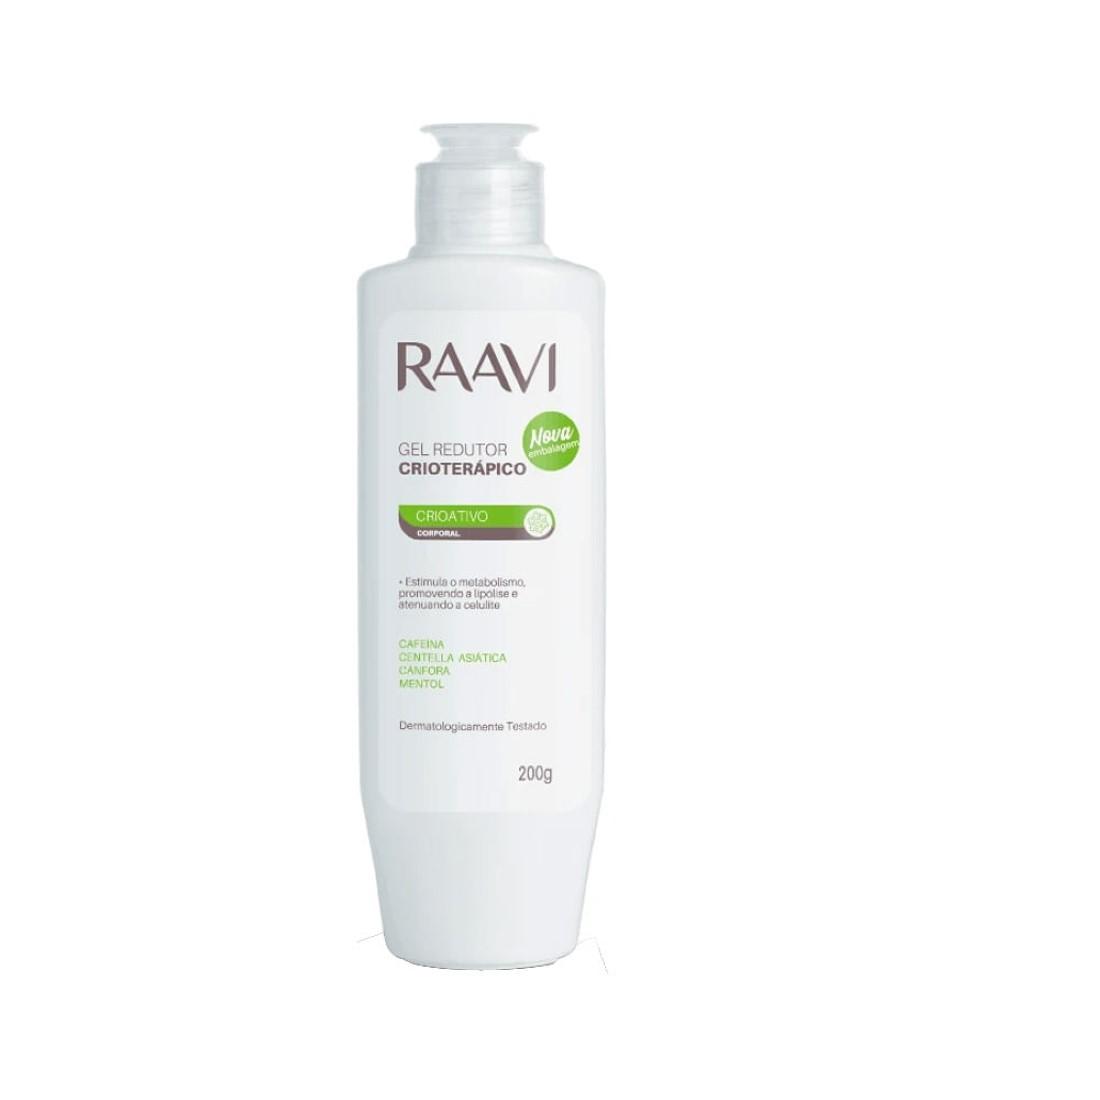 Gel Redutor Crioterápico 200g - Raavi